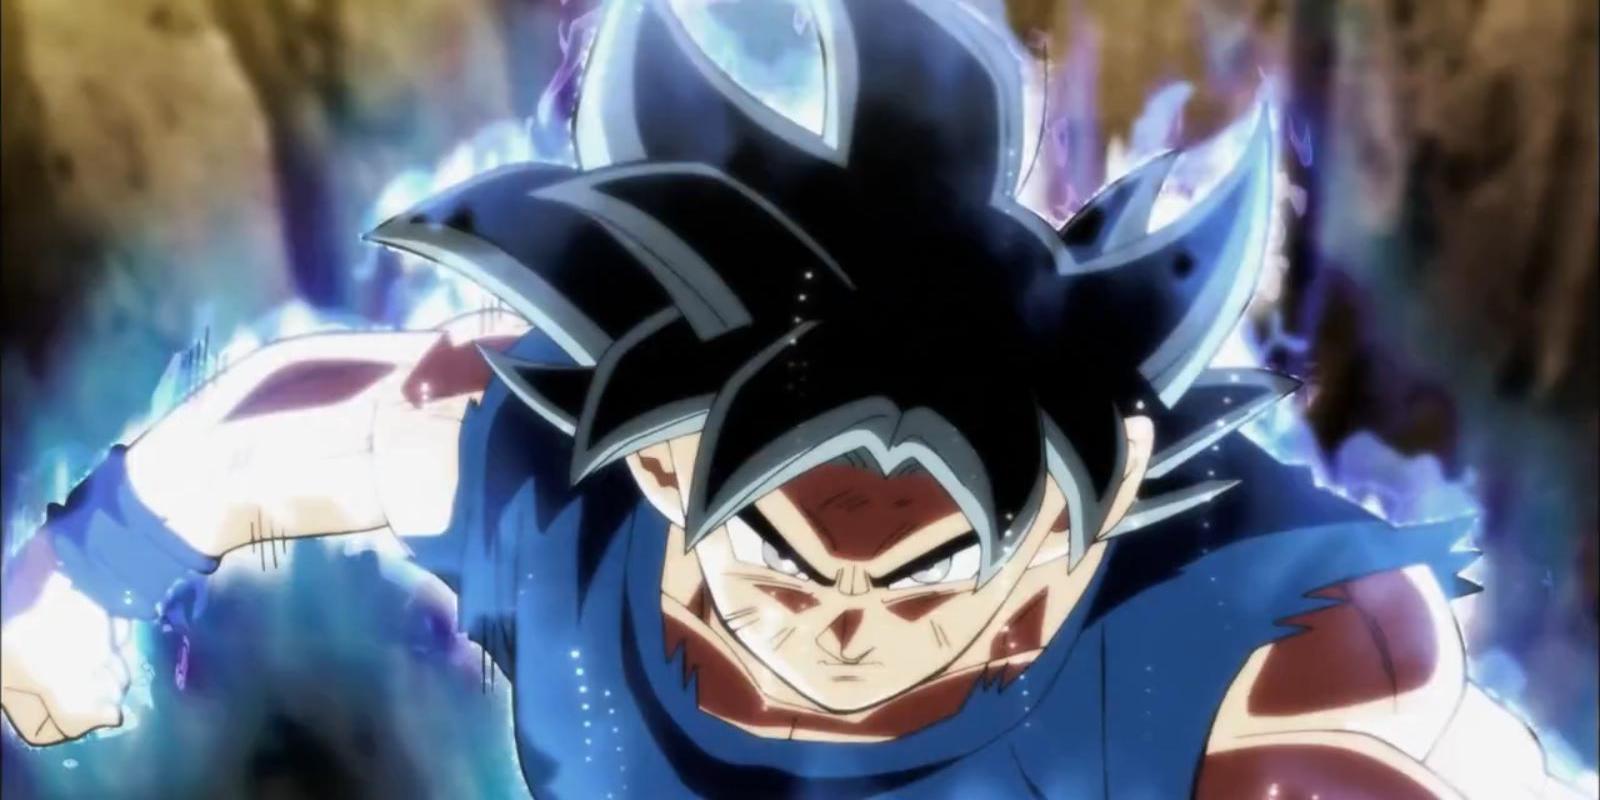 Dragon Ball Super Reveals Goku's Ultra Instinct Look